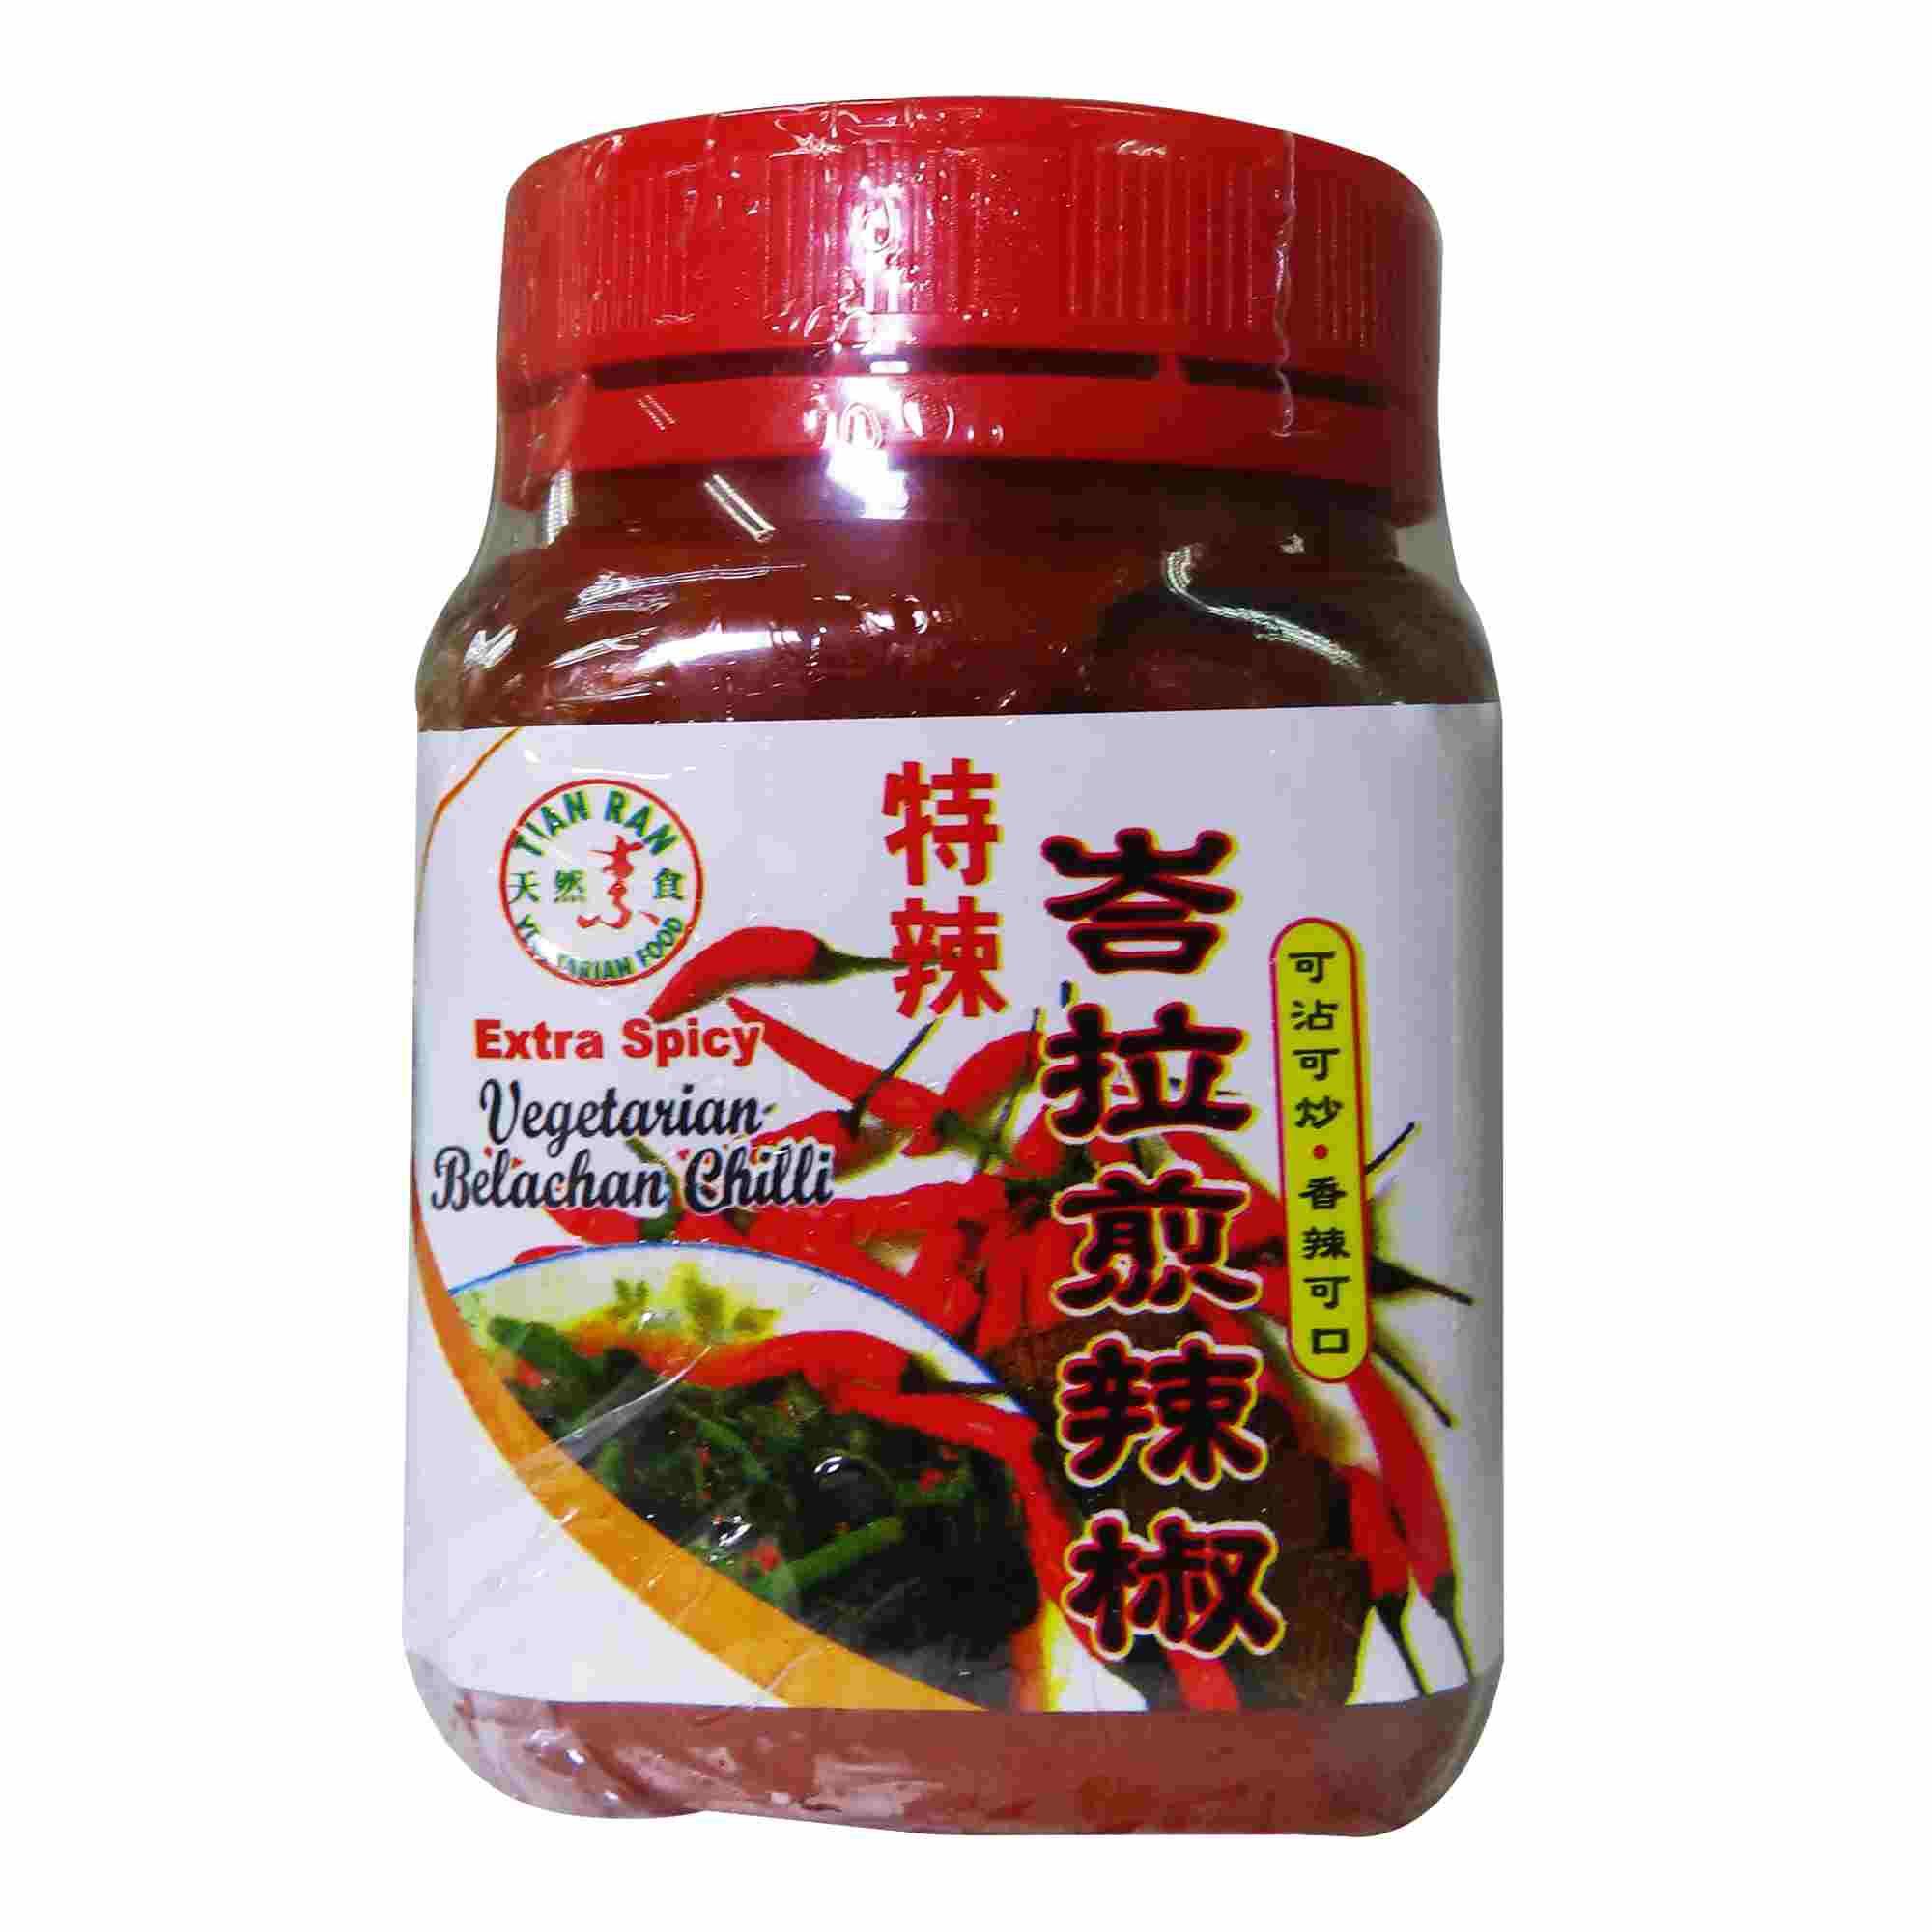 Image Extra Spicy Vegetarian Balachan Chili 天然-特辣峇拉煎辣椒 180grams